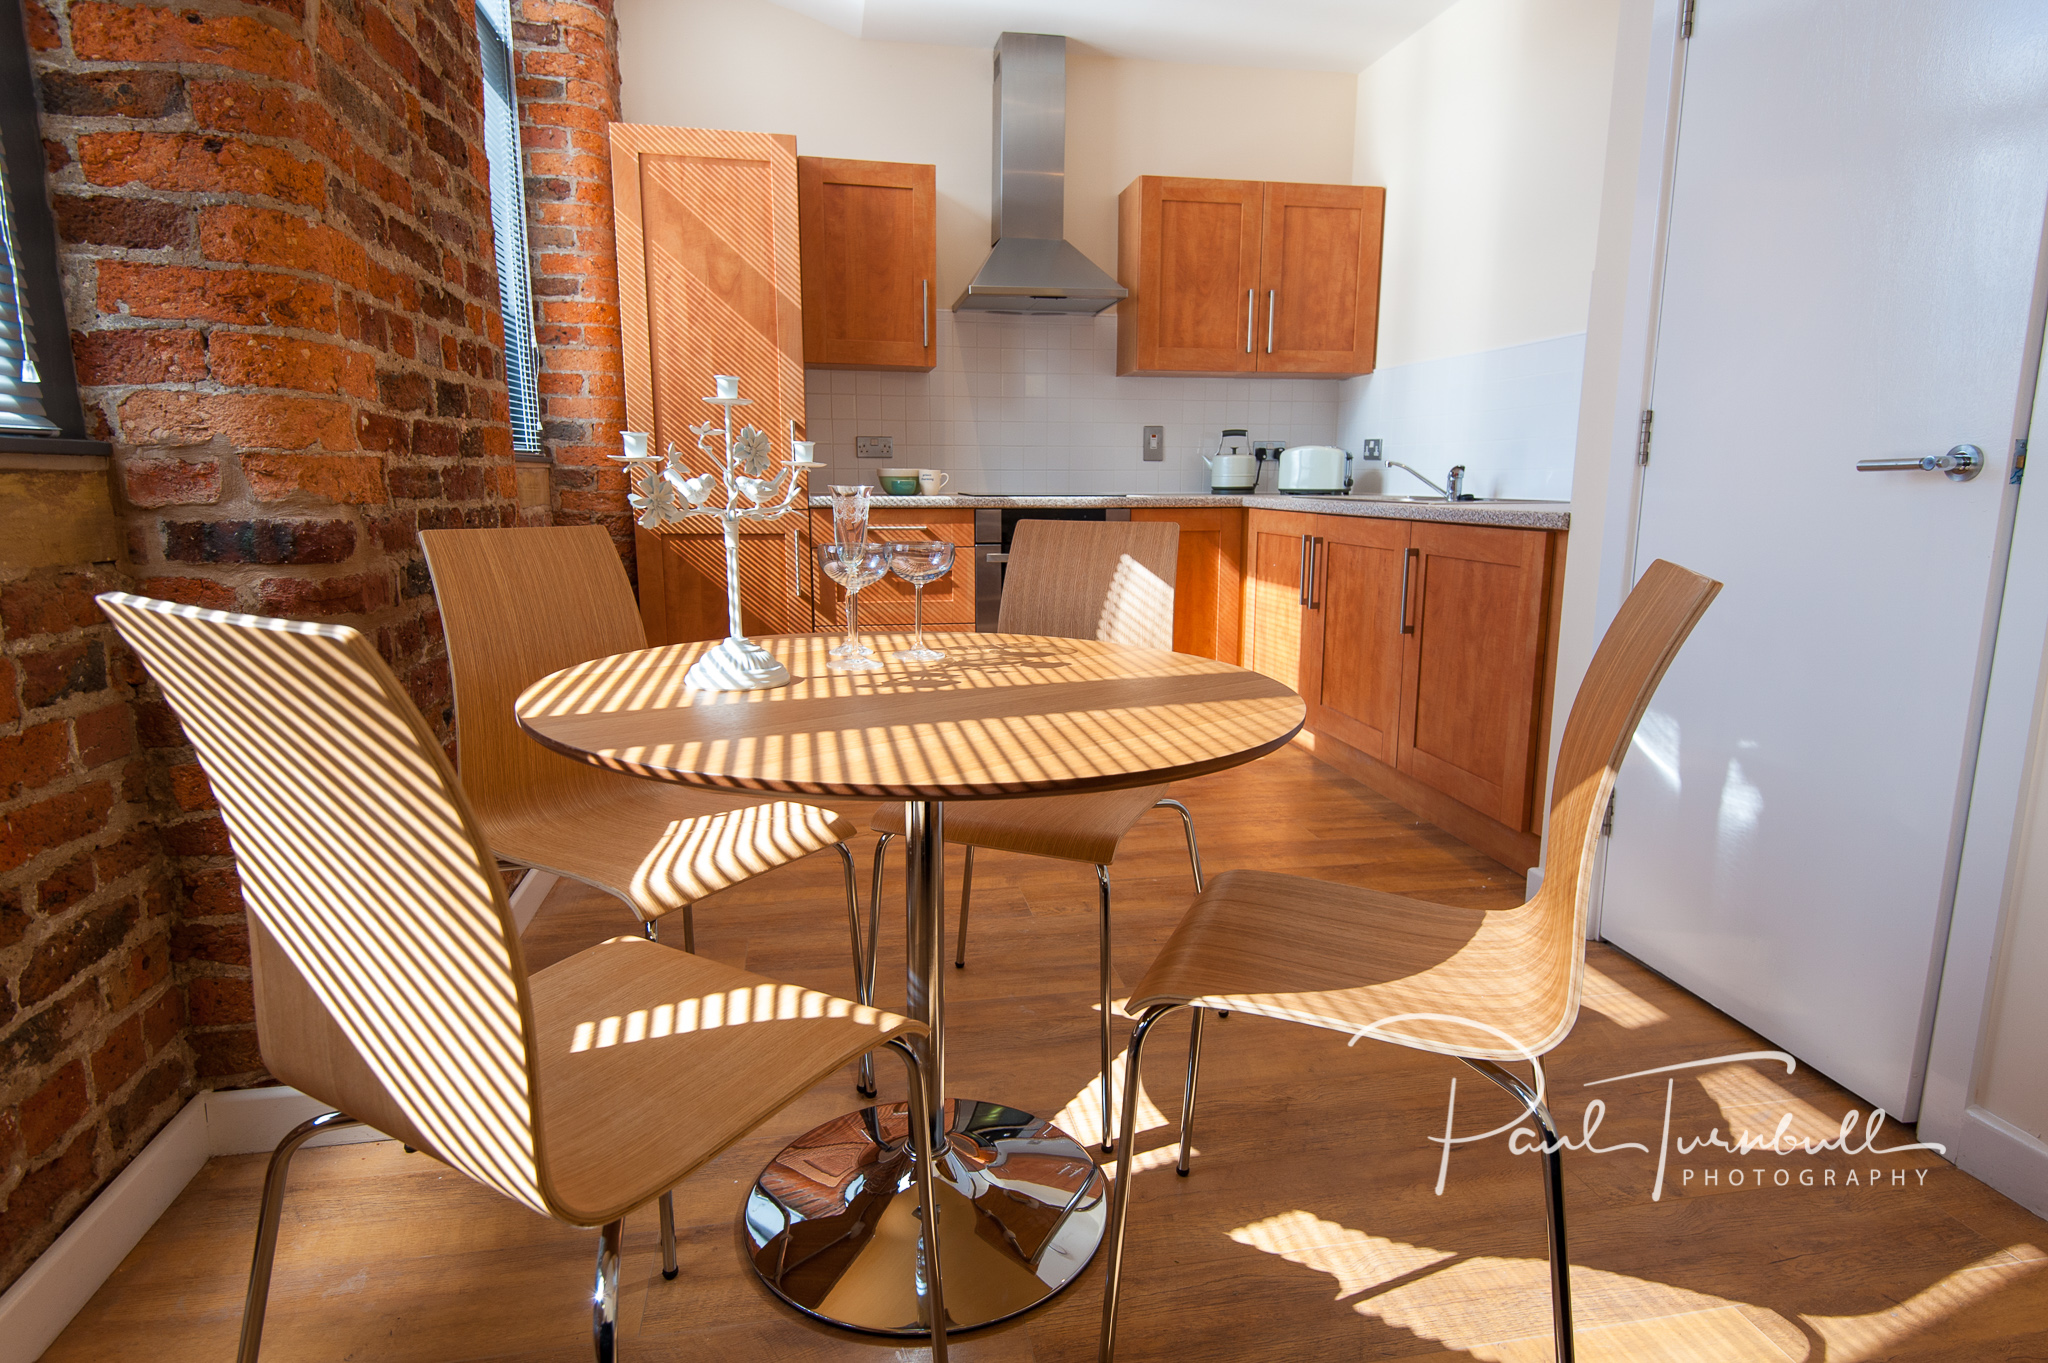 commercial-property-photographer-leeds-yorkshire-blackbrook-developments-044.jpg